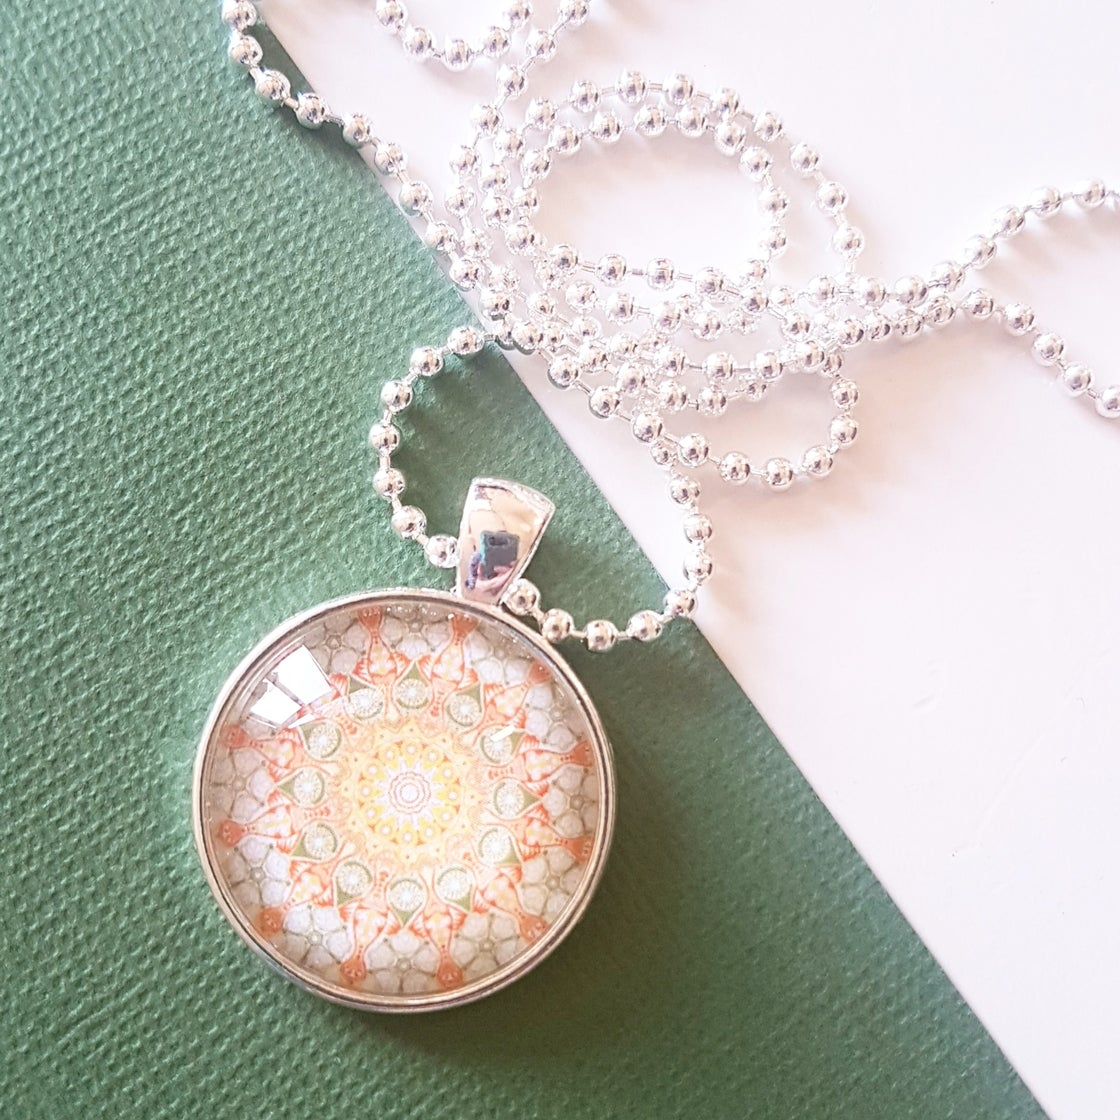 Image of 1inch pendant - Olive/Coral Mandala